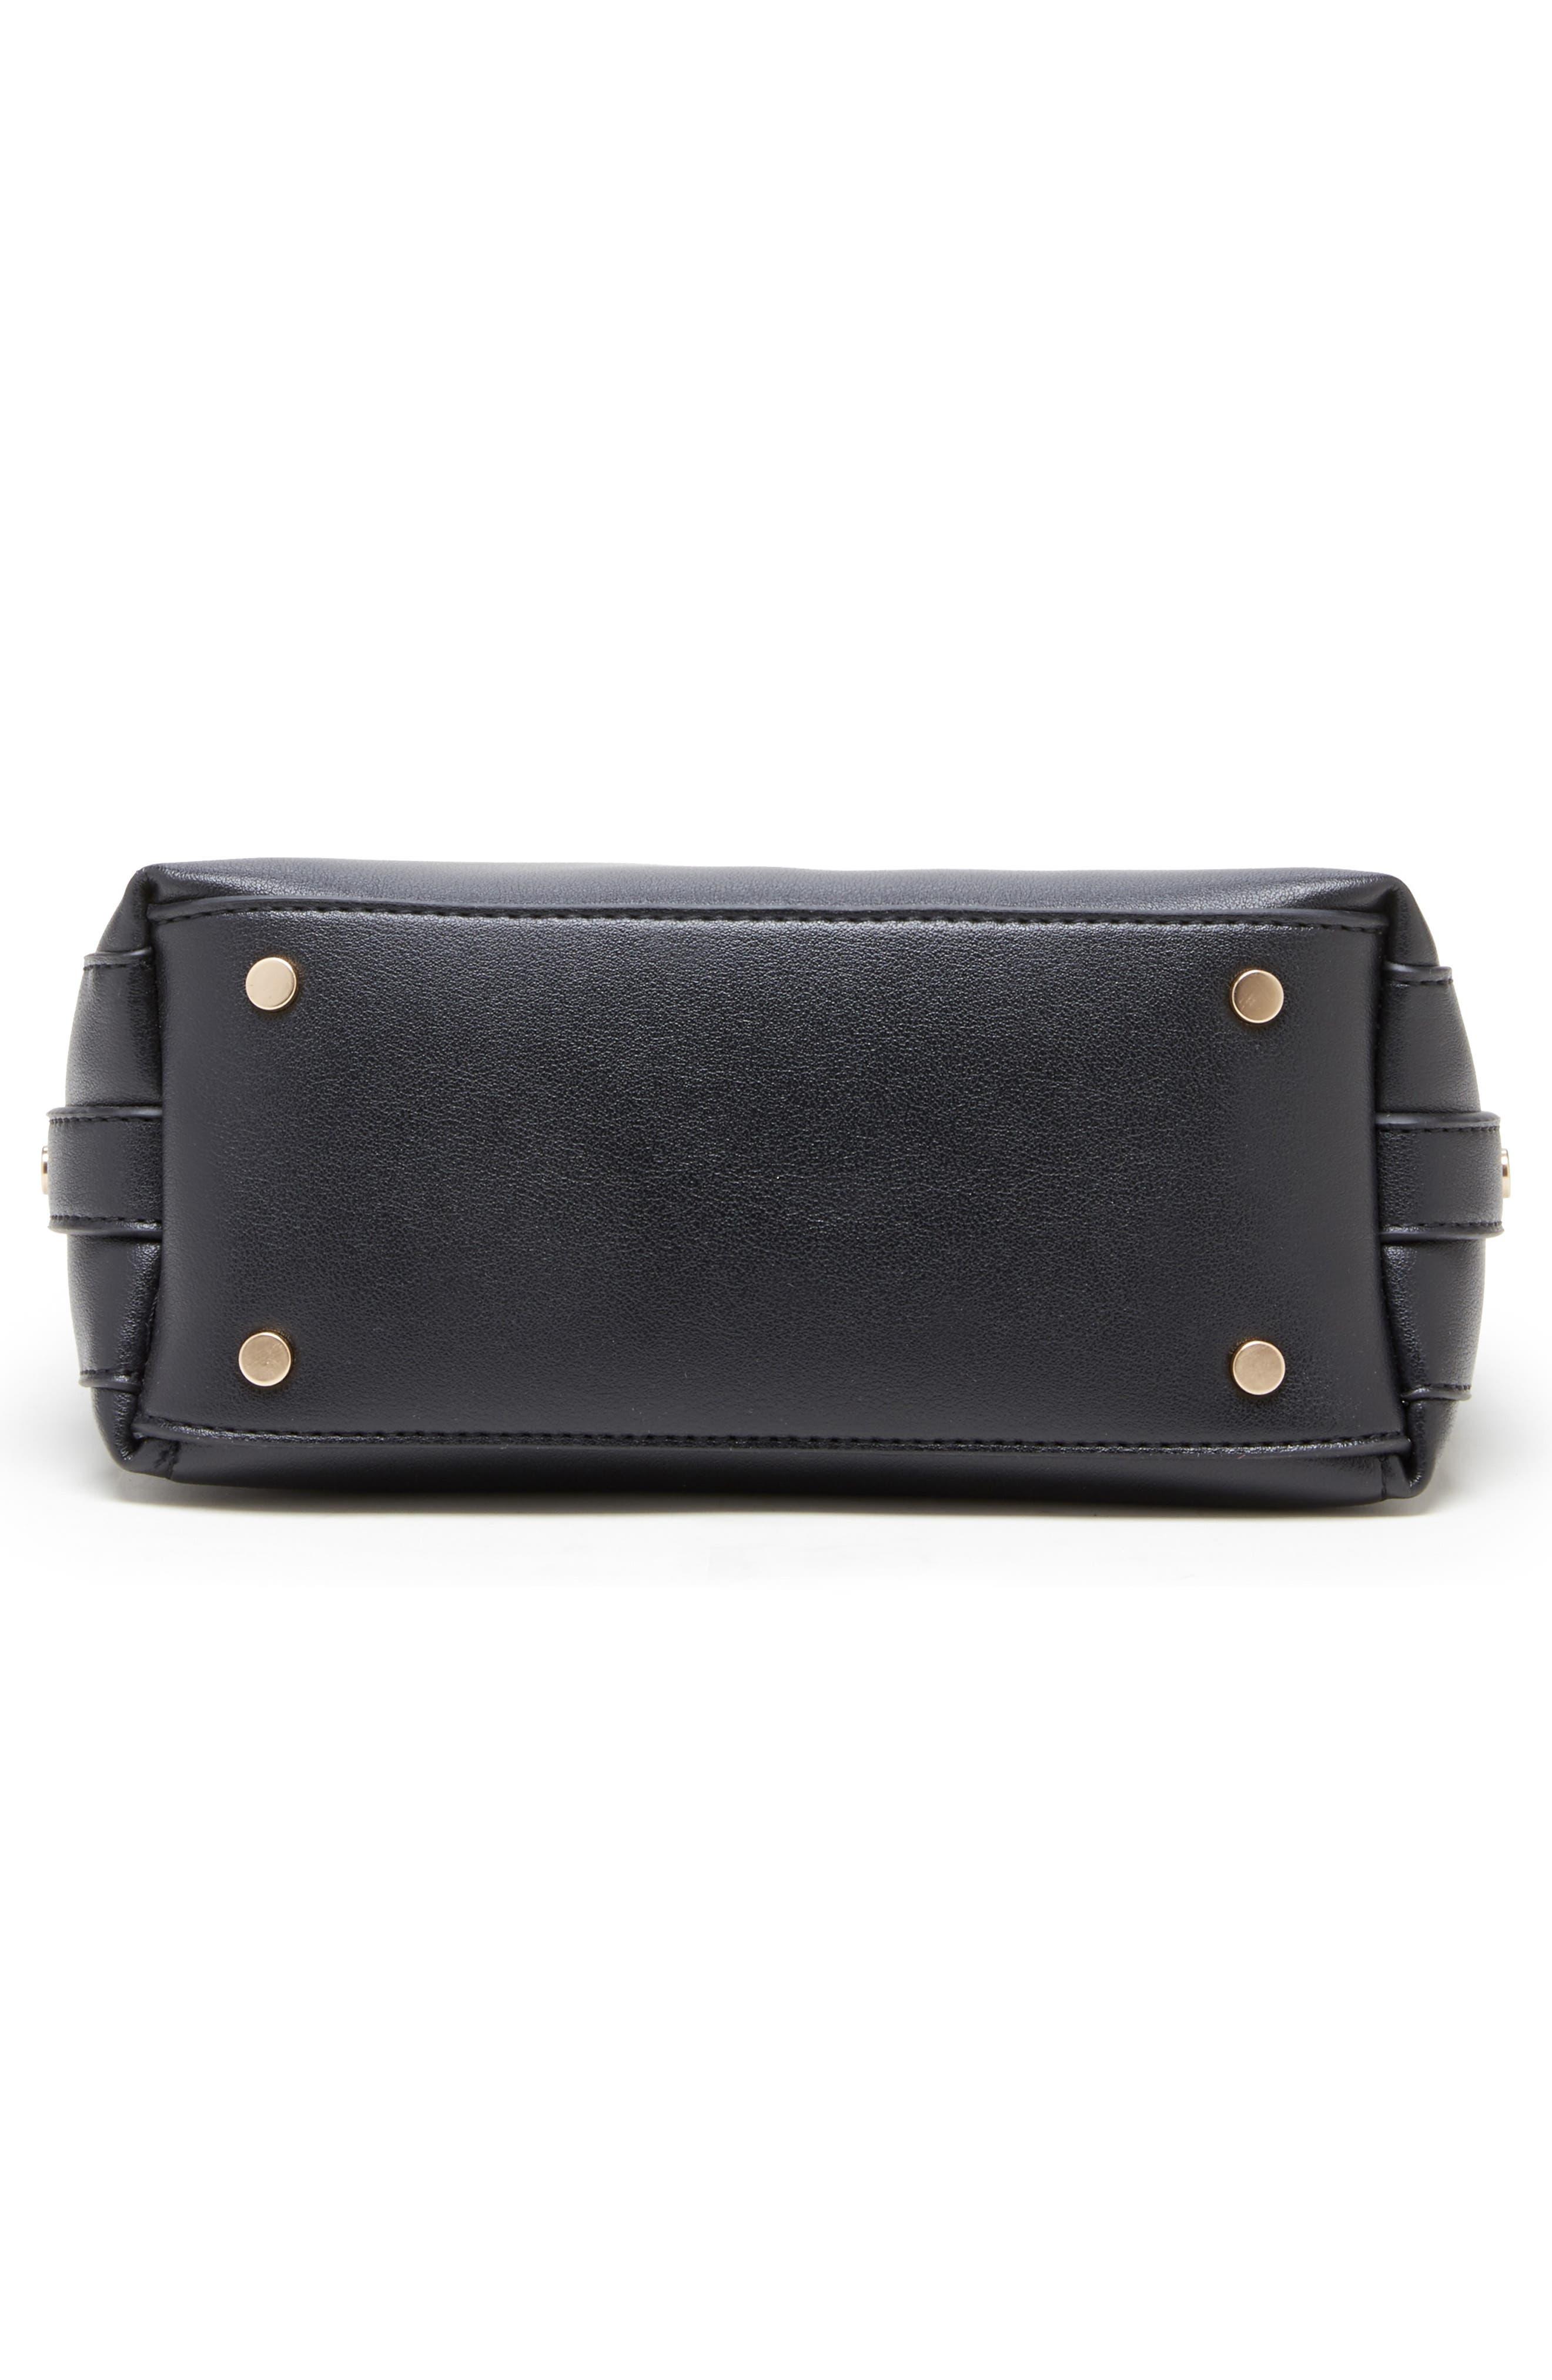 Hingi Faux Leather Shoulder Bag,                             Alternate thumbnail 5, color,                             BLACK